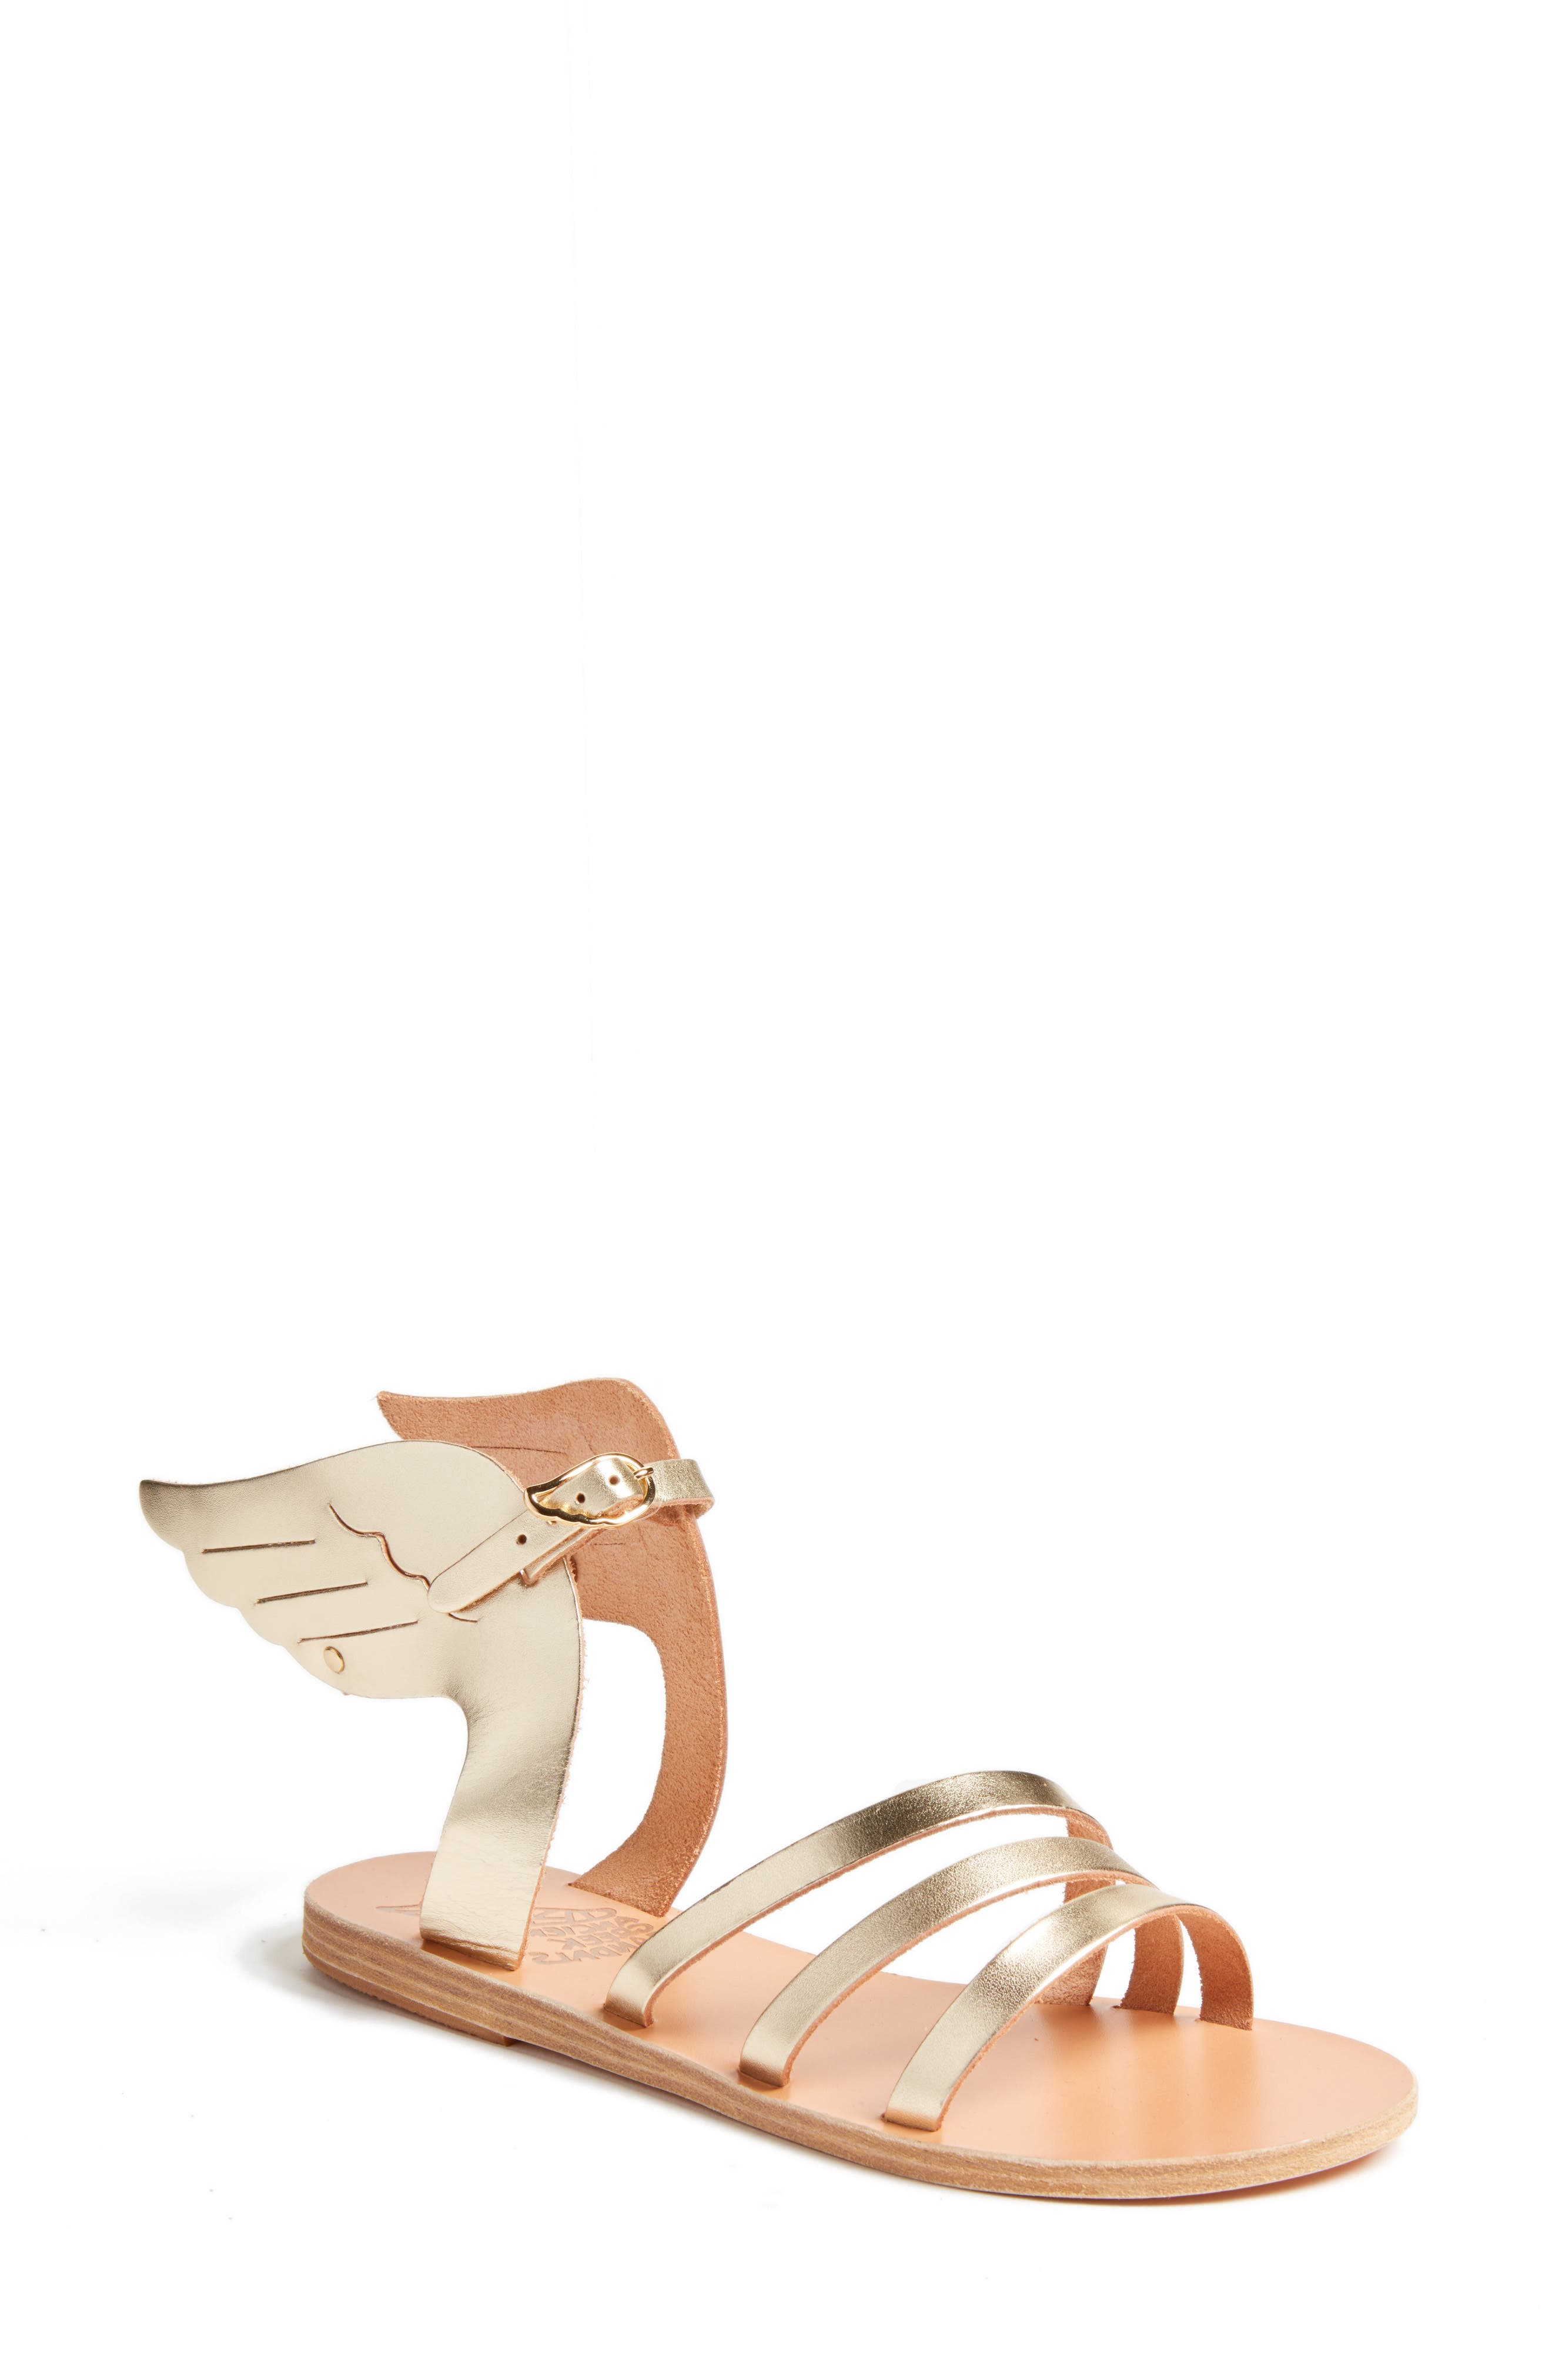 Main Image - Ancient Greek Sandals Ikaria Sandal (Women)